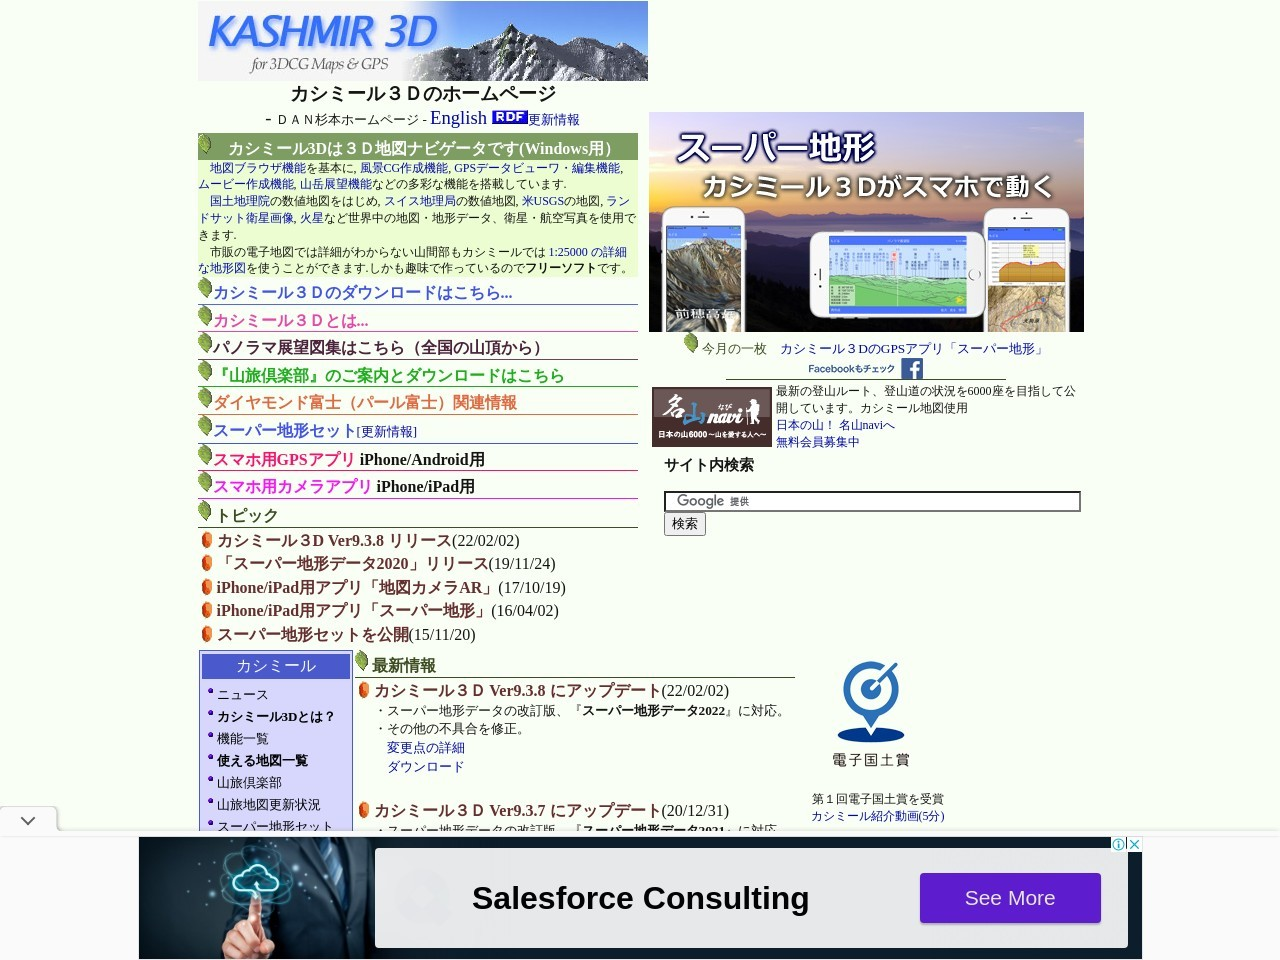 http://www.kashmir3d.com/kash/manual/gps_edit.htm